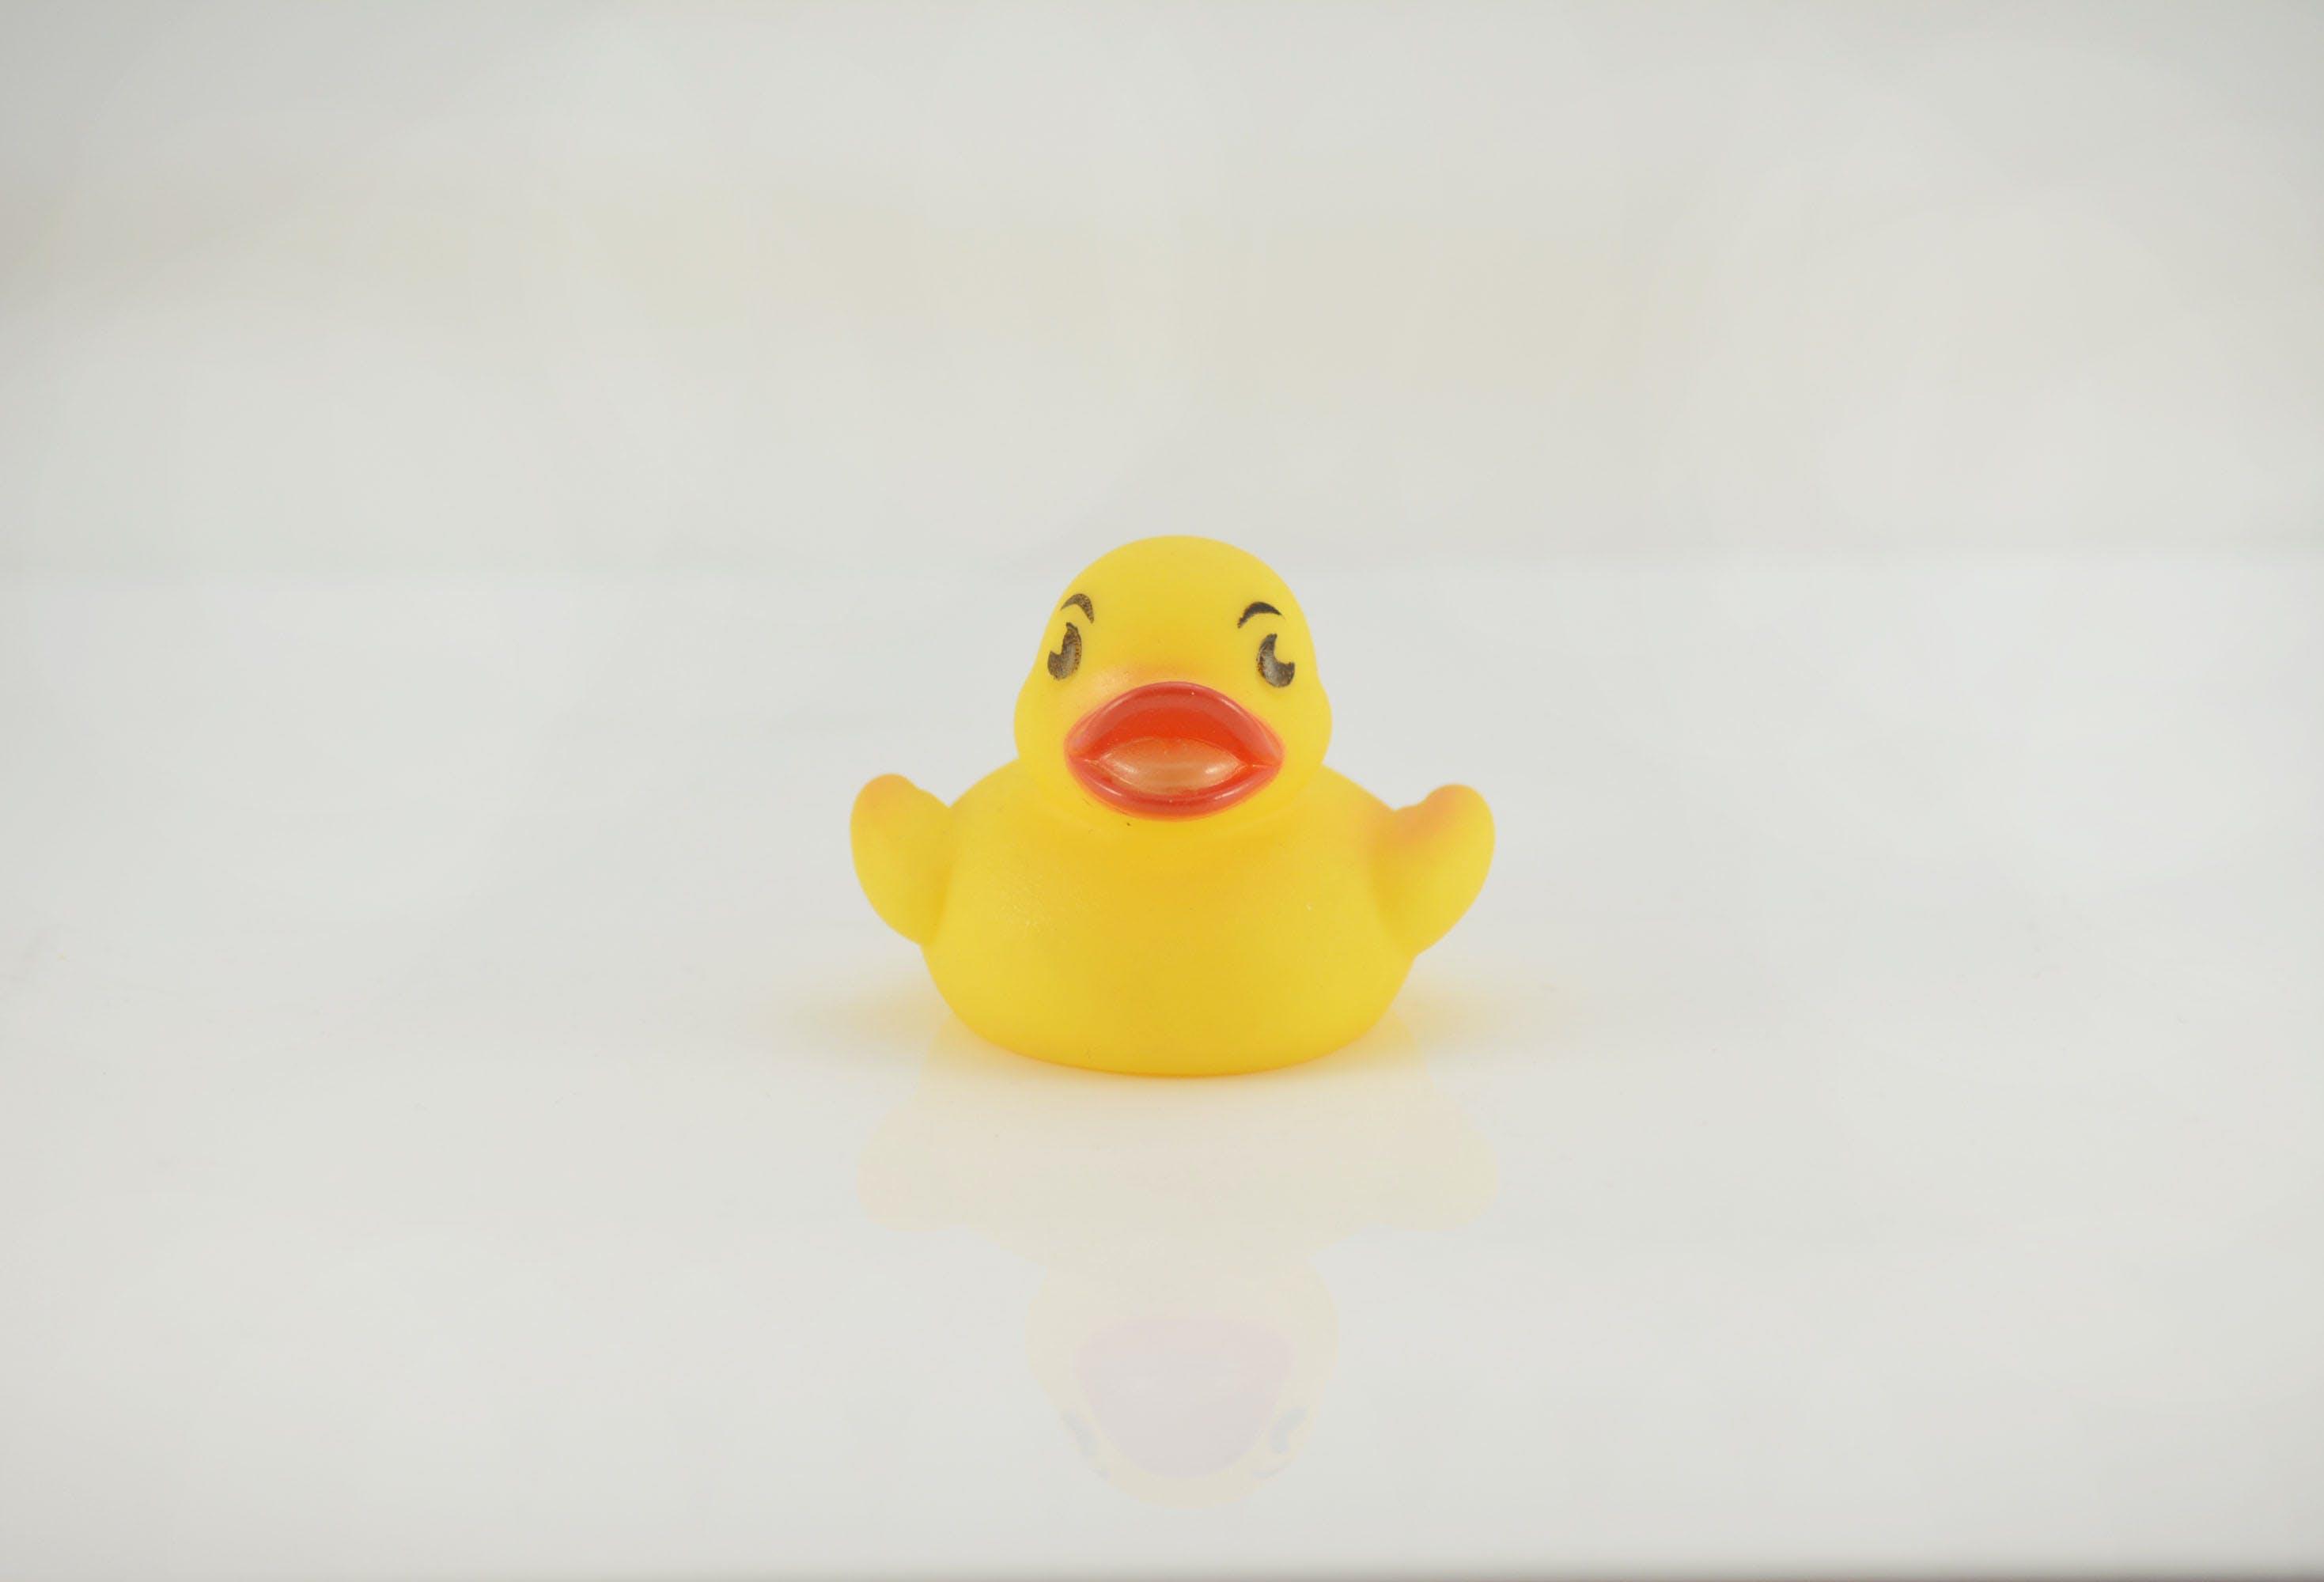 Gratis lagerfoto af bad legetøj, ducky, gummi ducky, gummi legetøj